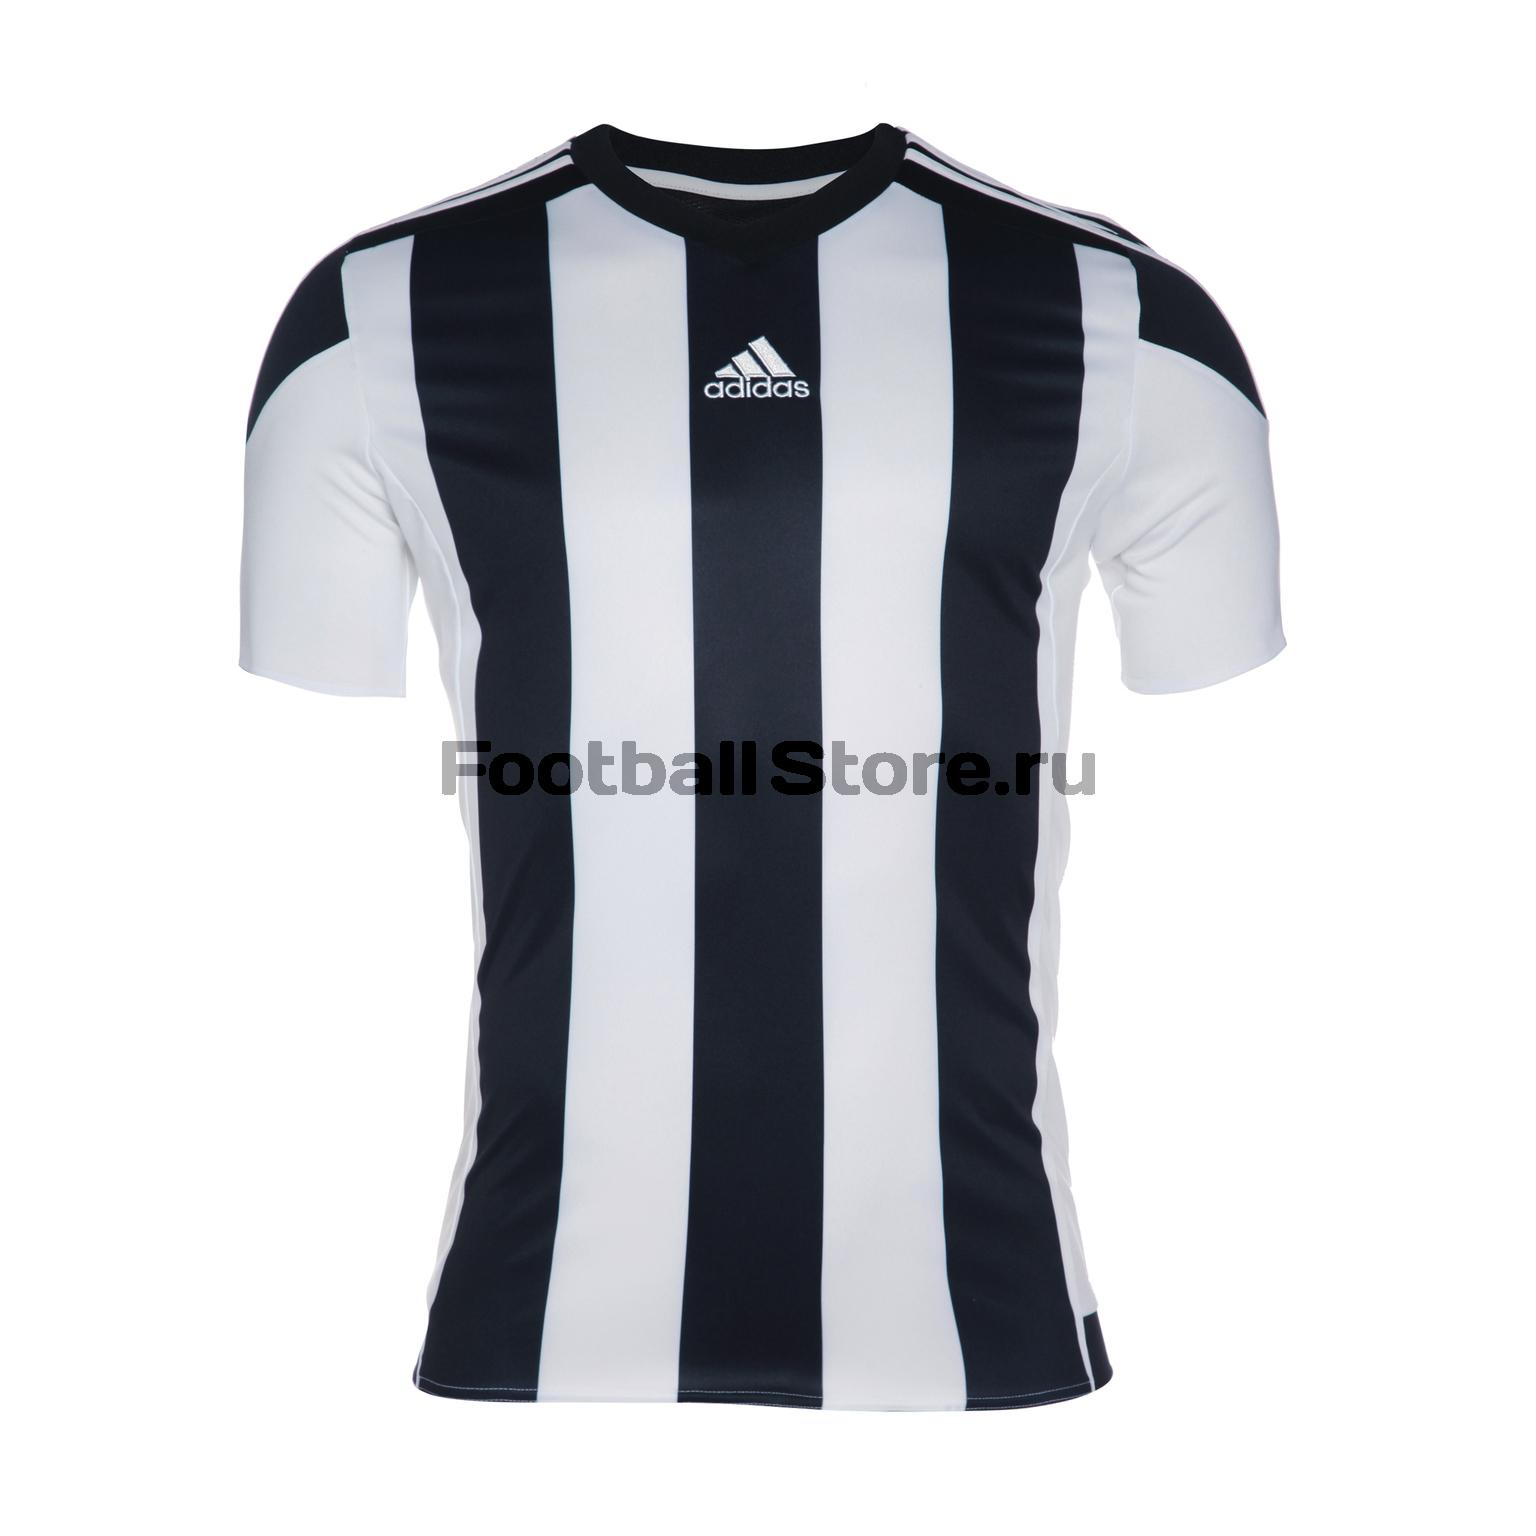 Футболки Adidas Футболка игровая Adidas Striped 15 JSY M62777